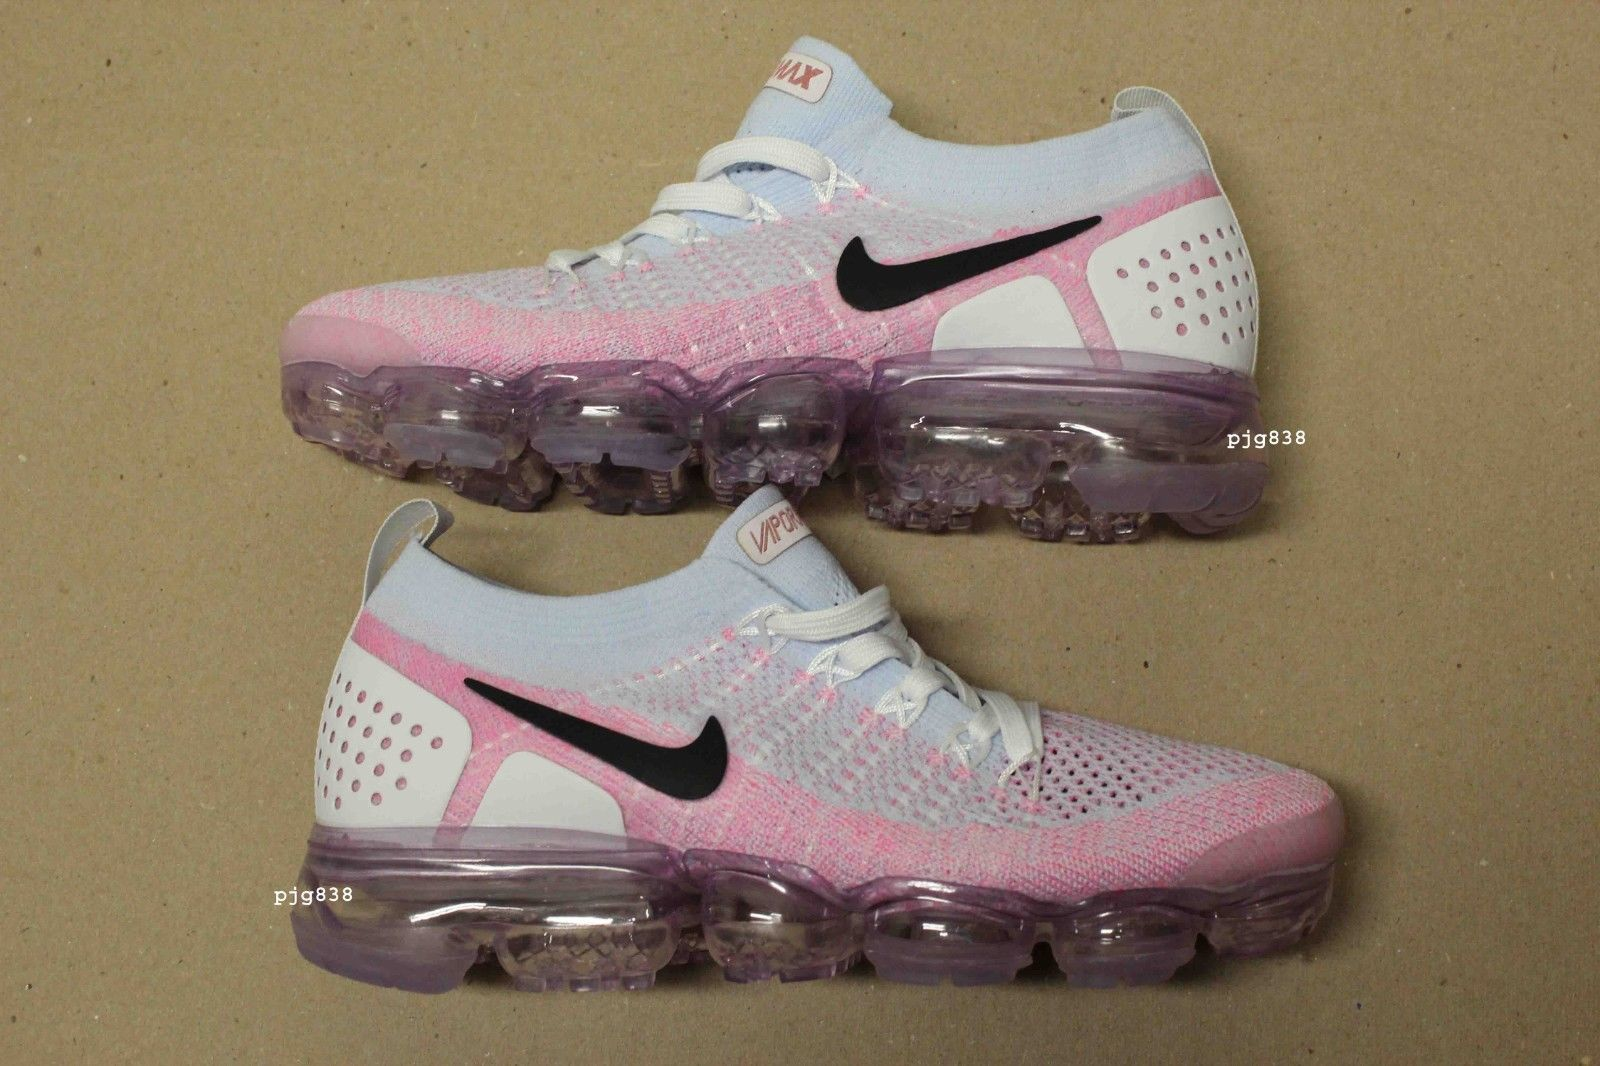 big sale 77e7b 93579 Details about Women's Nike Air VaporMax Flyknit 2 v2 size 8 ...